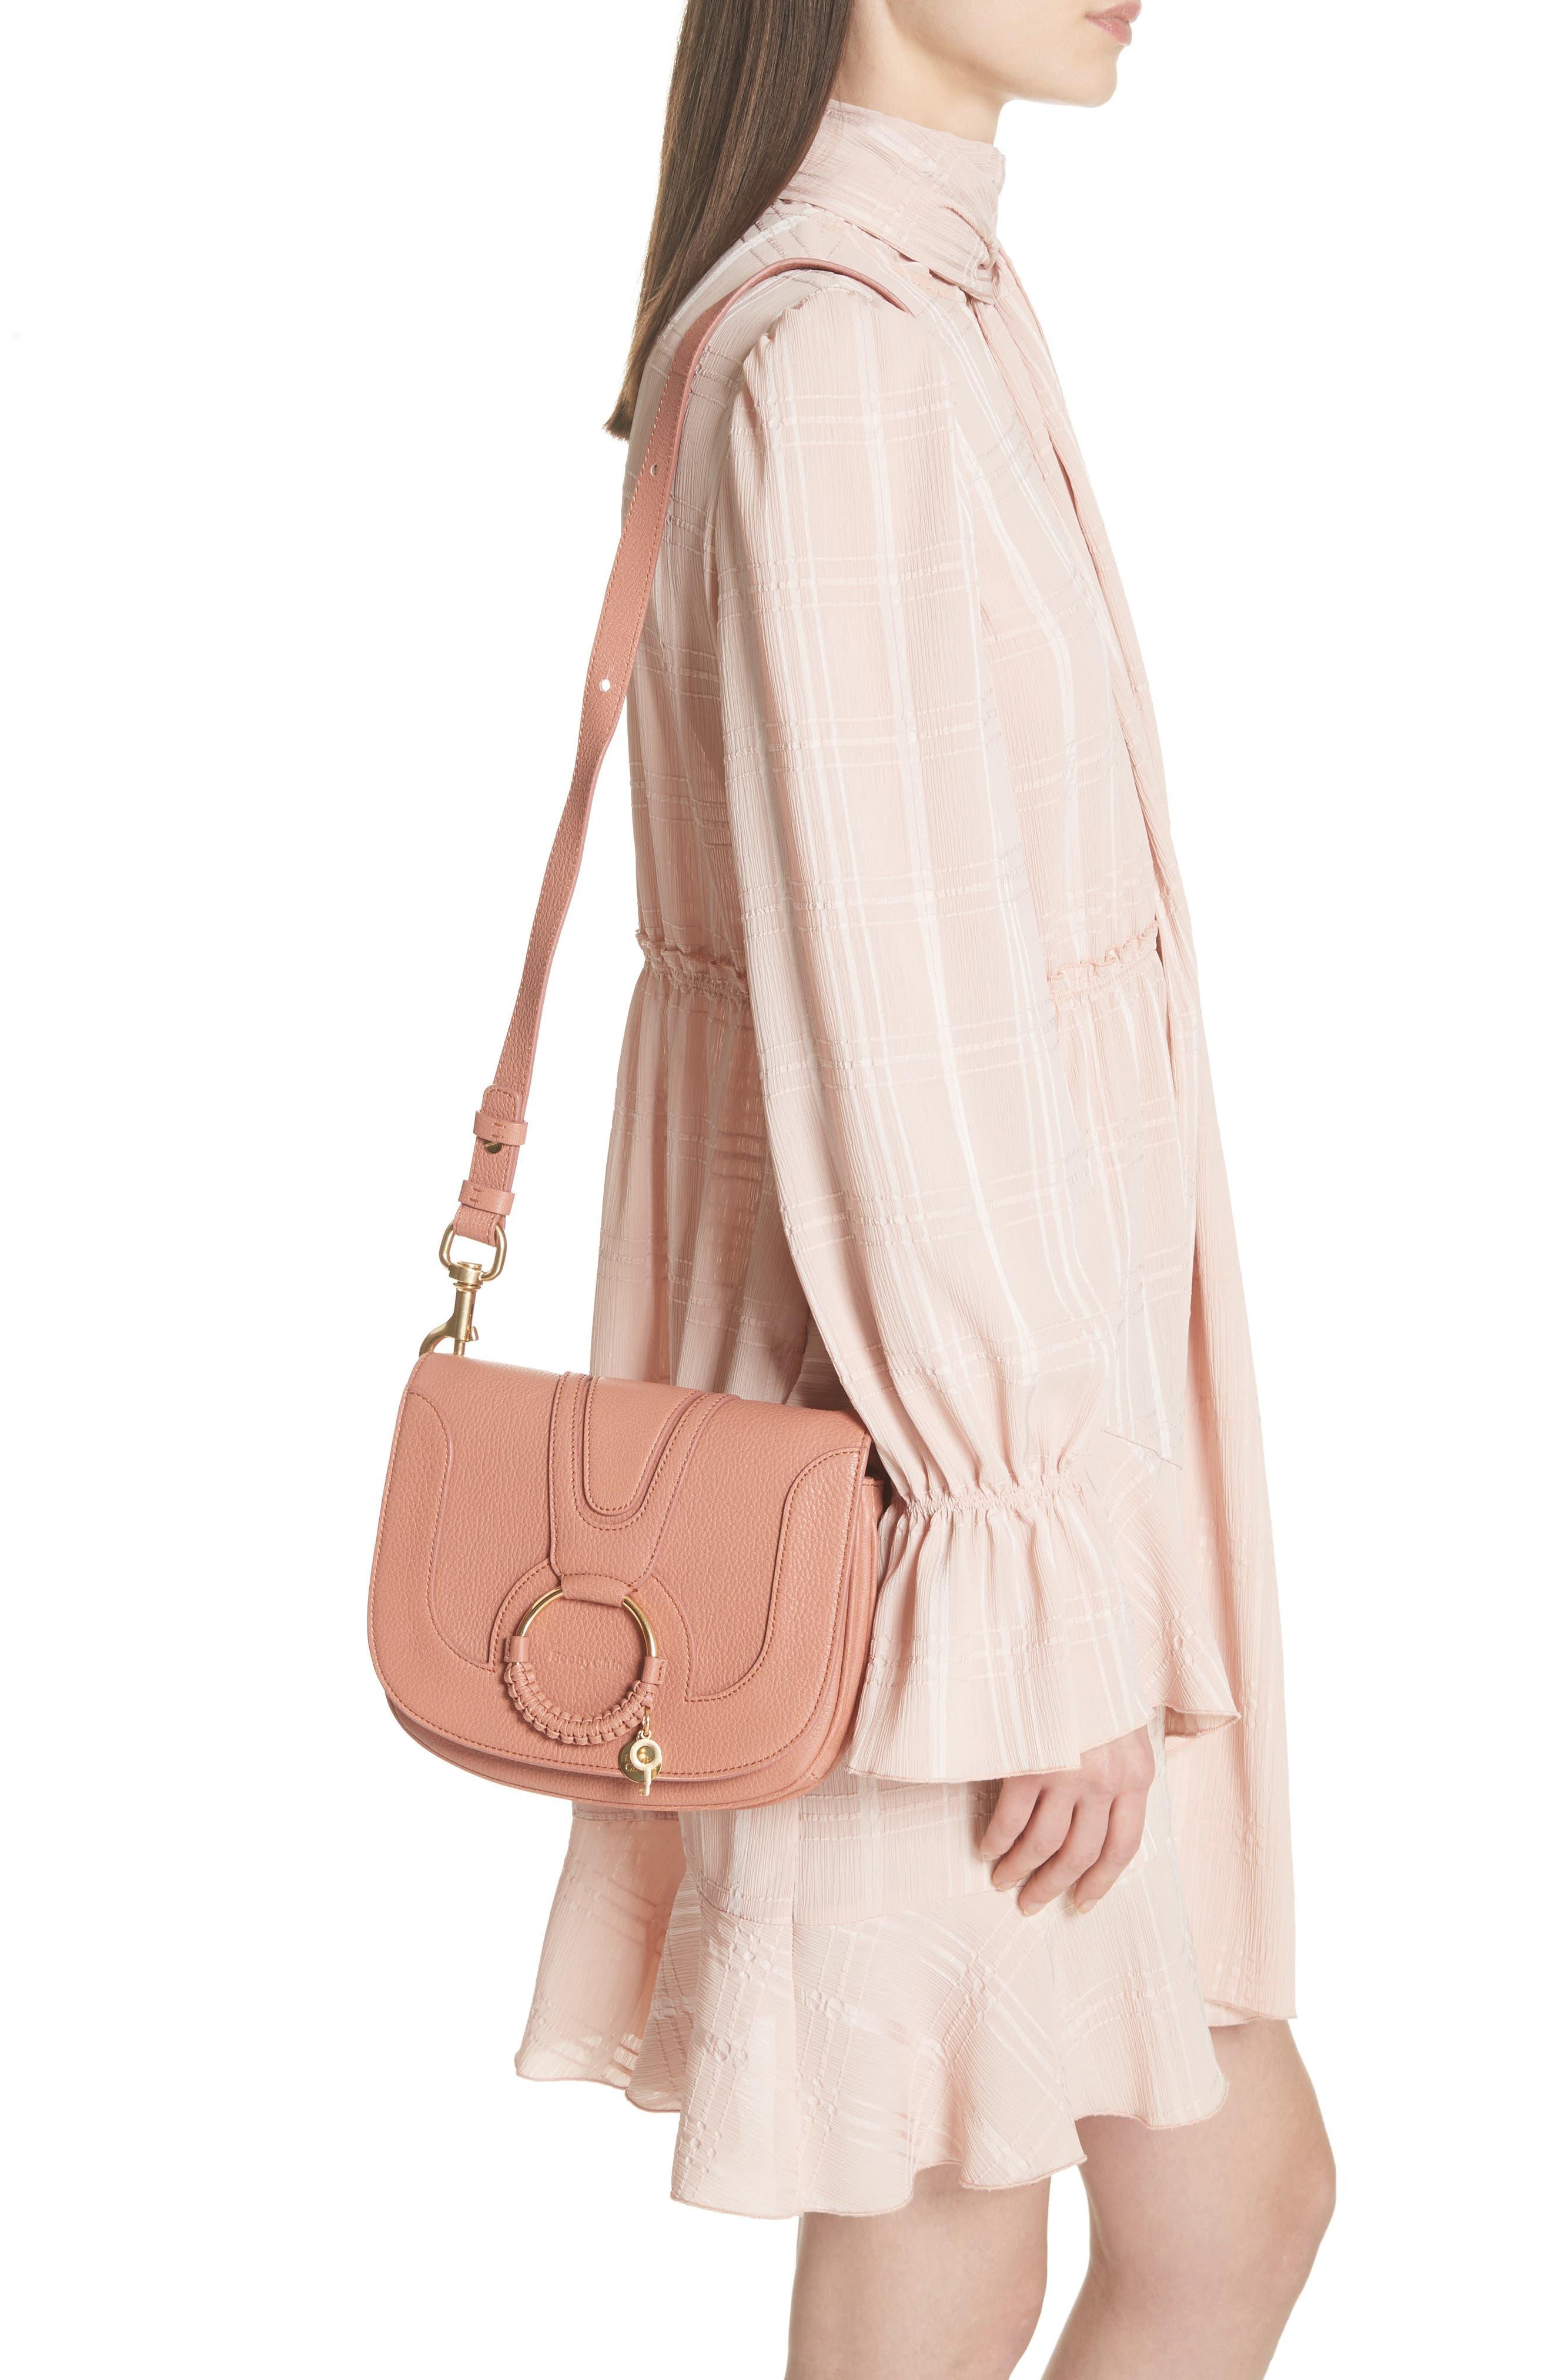 Hana Small Leather Crossbody Bag,                             Alternate thumbnail 11, color,